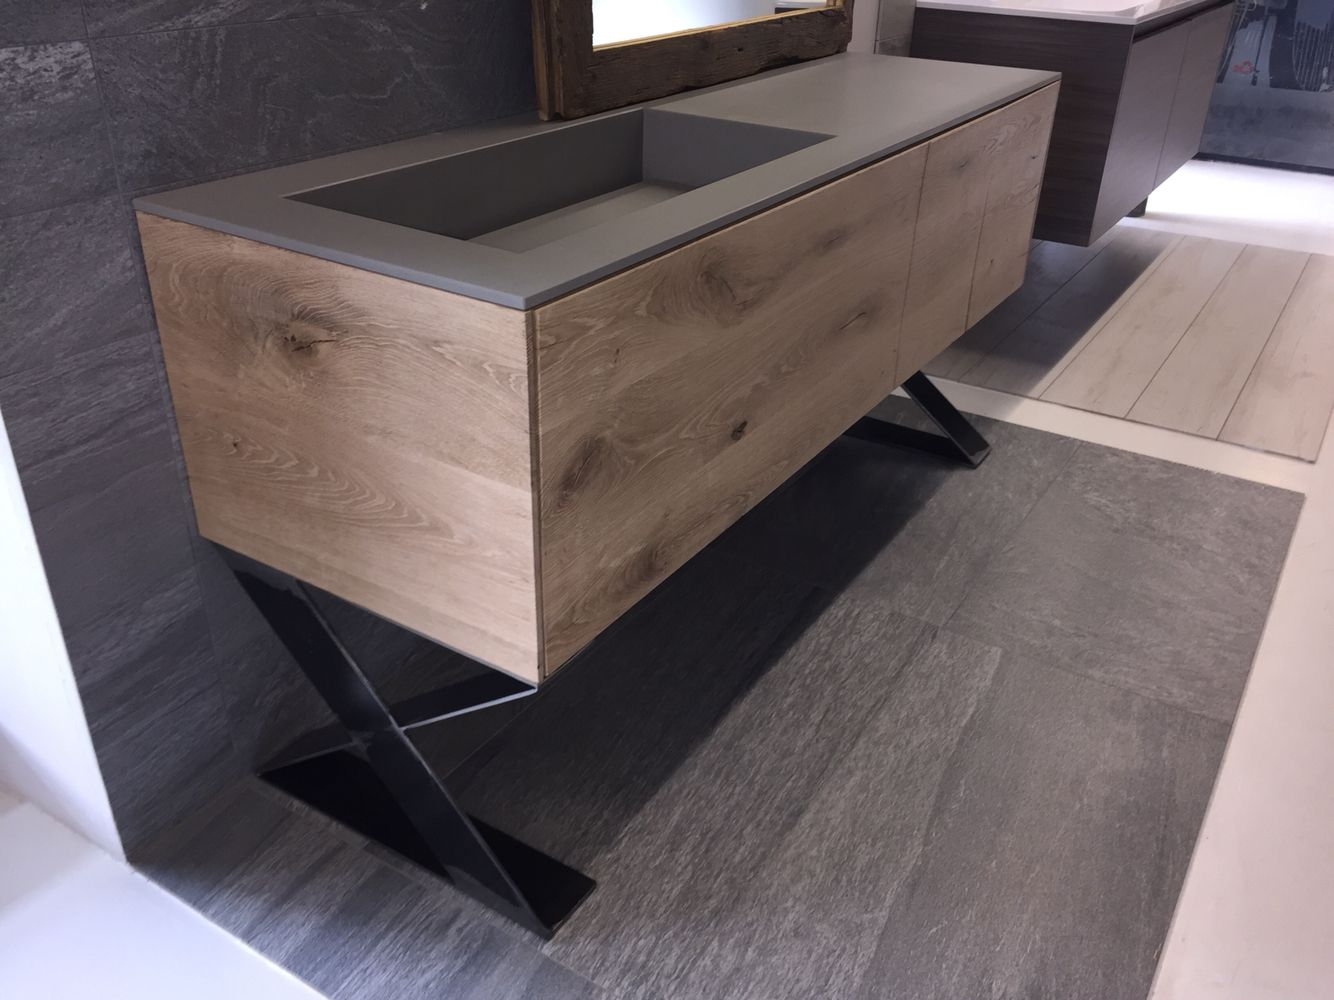 Industrie Design Badmobel Von Www One Bath De Wunderschoner